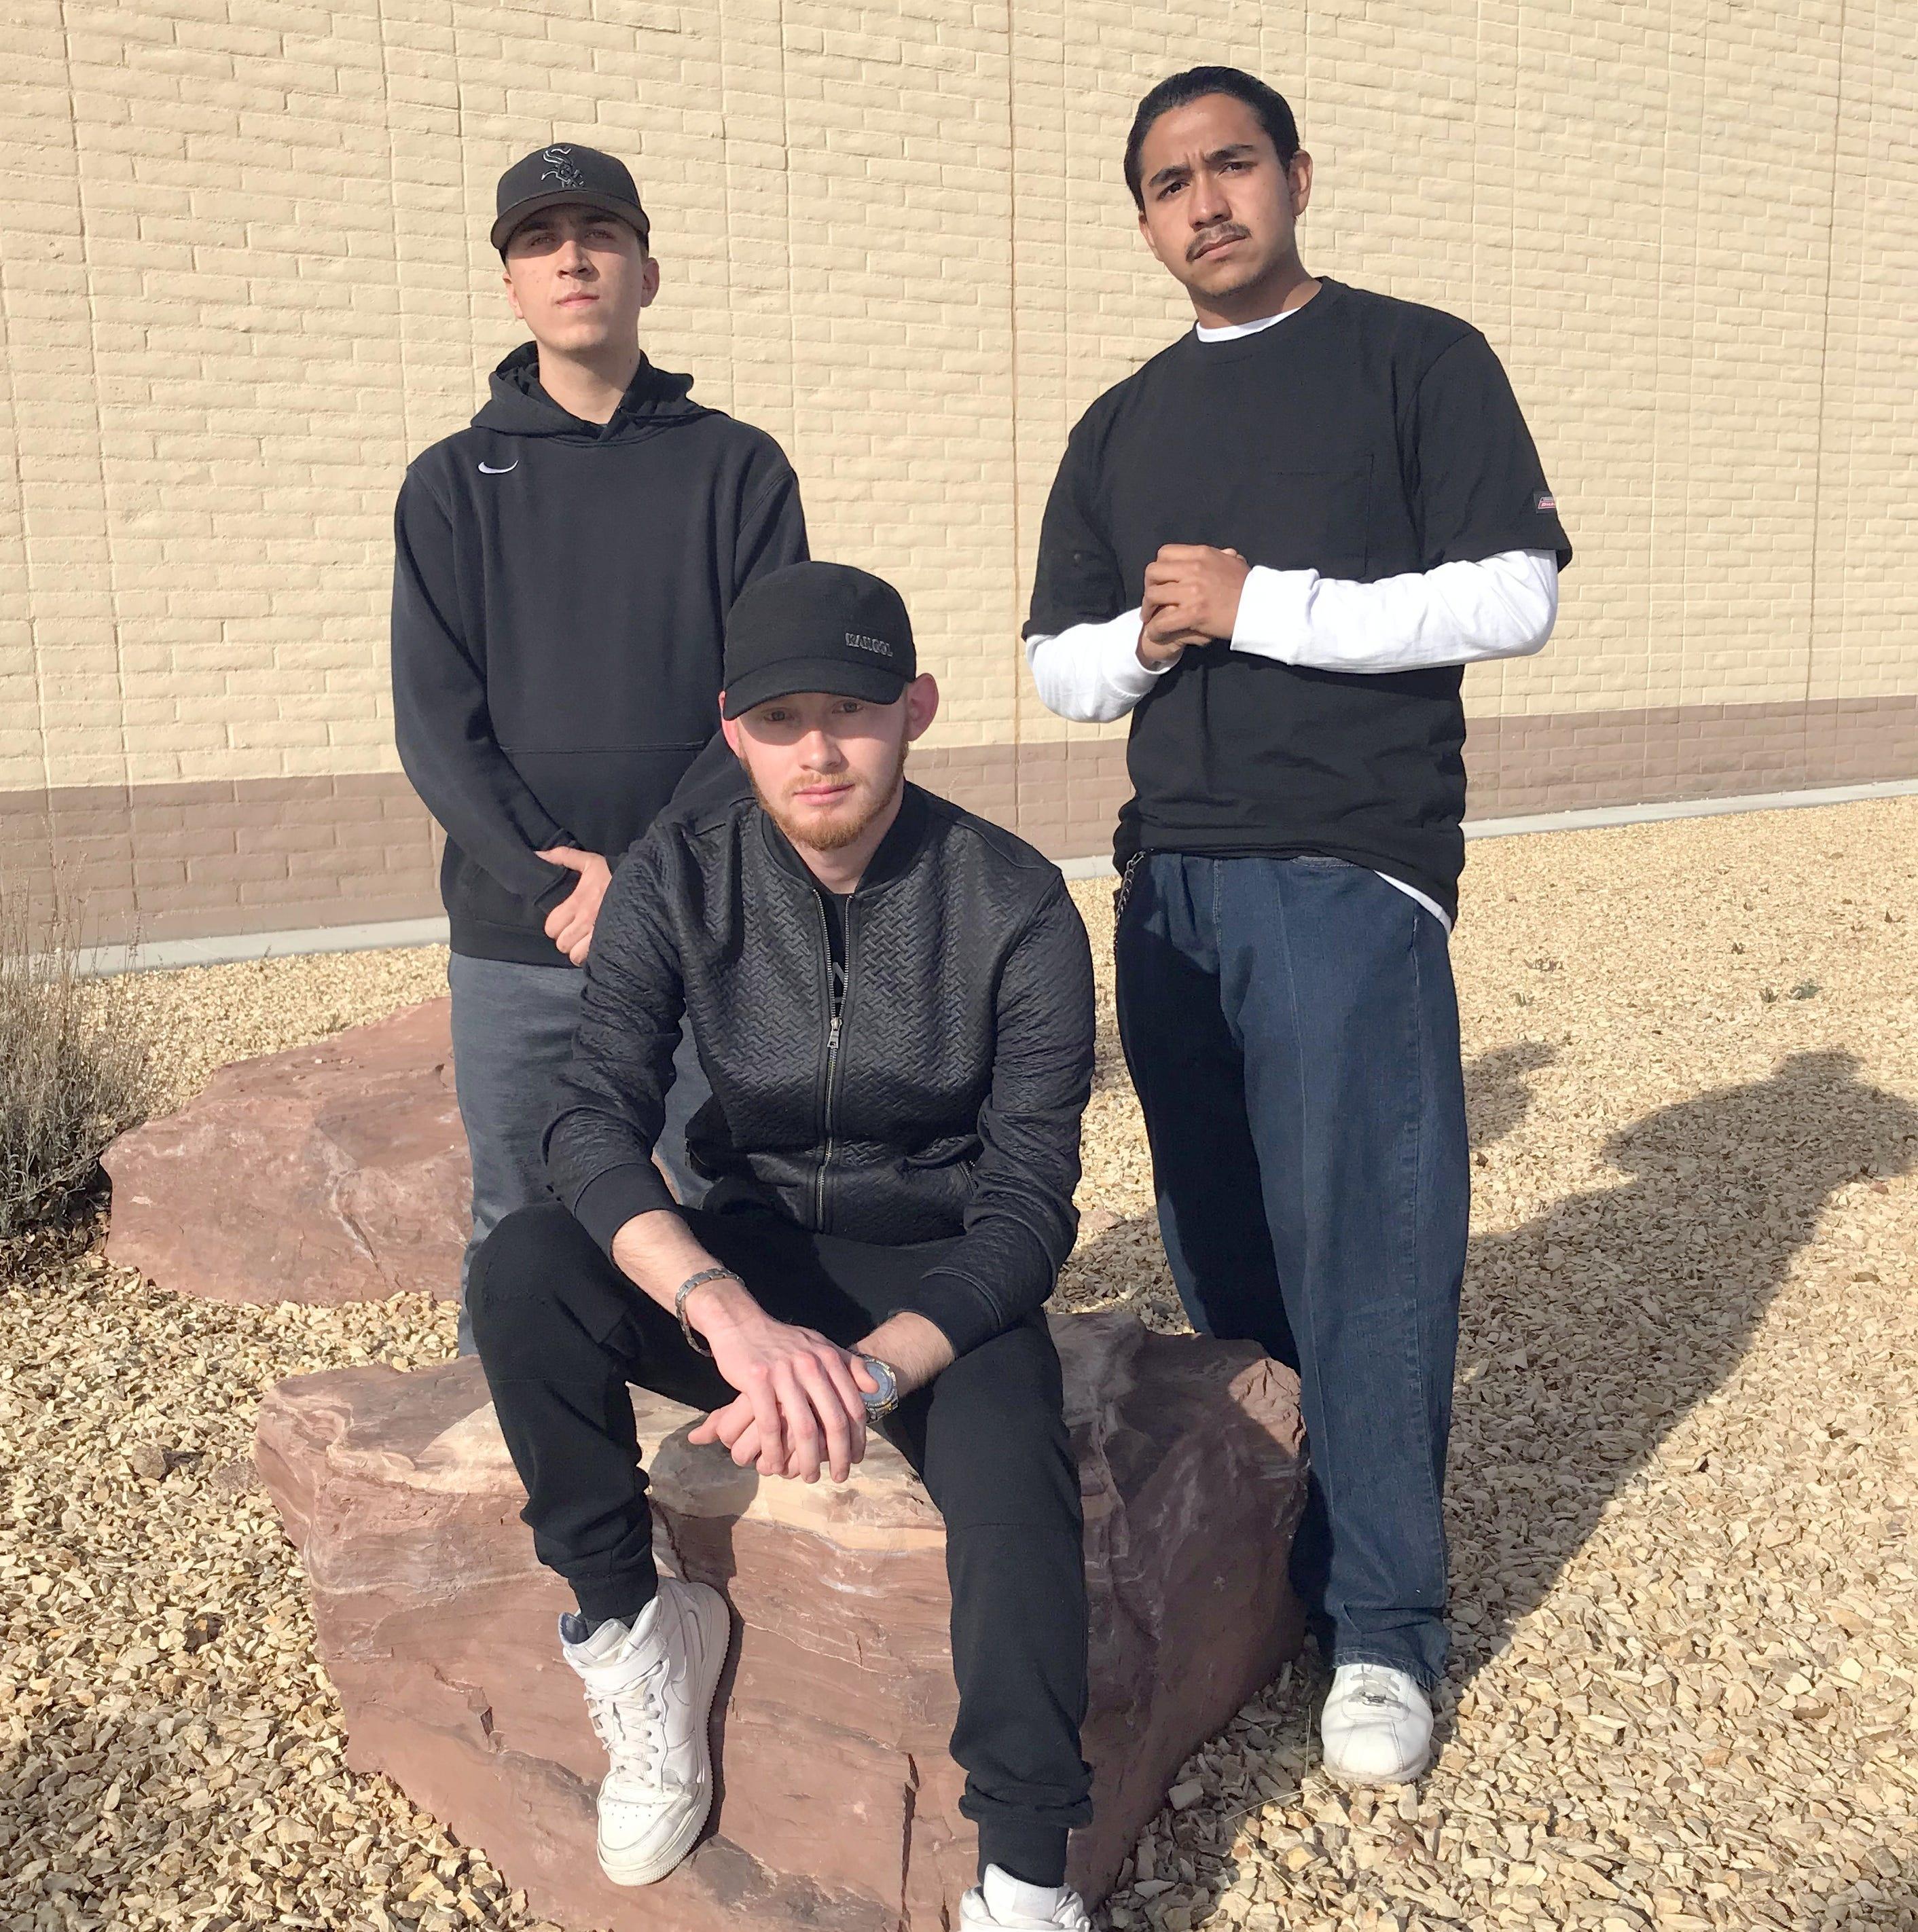 Deming High rap artists plan 'Uprising' show at Deming Public Schools Auditorium